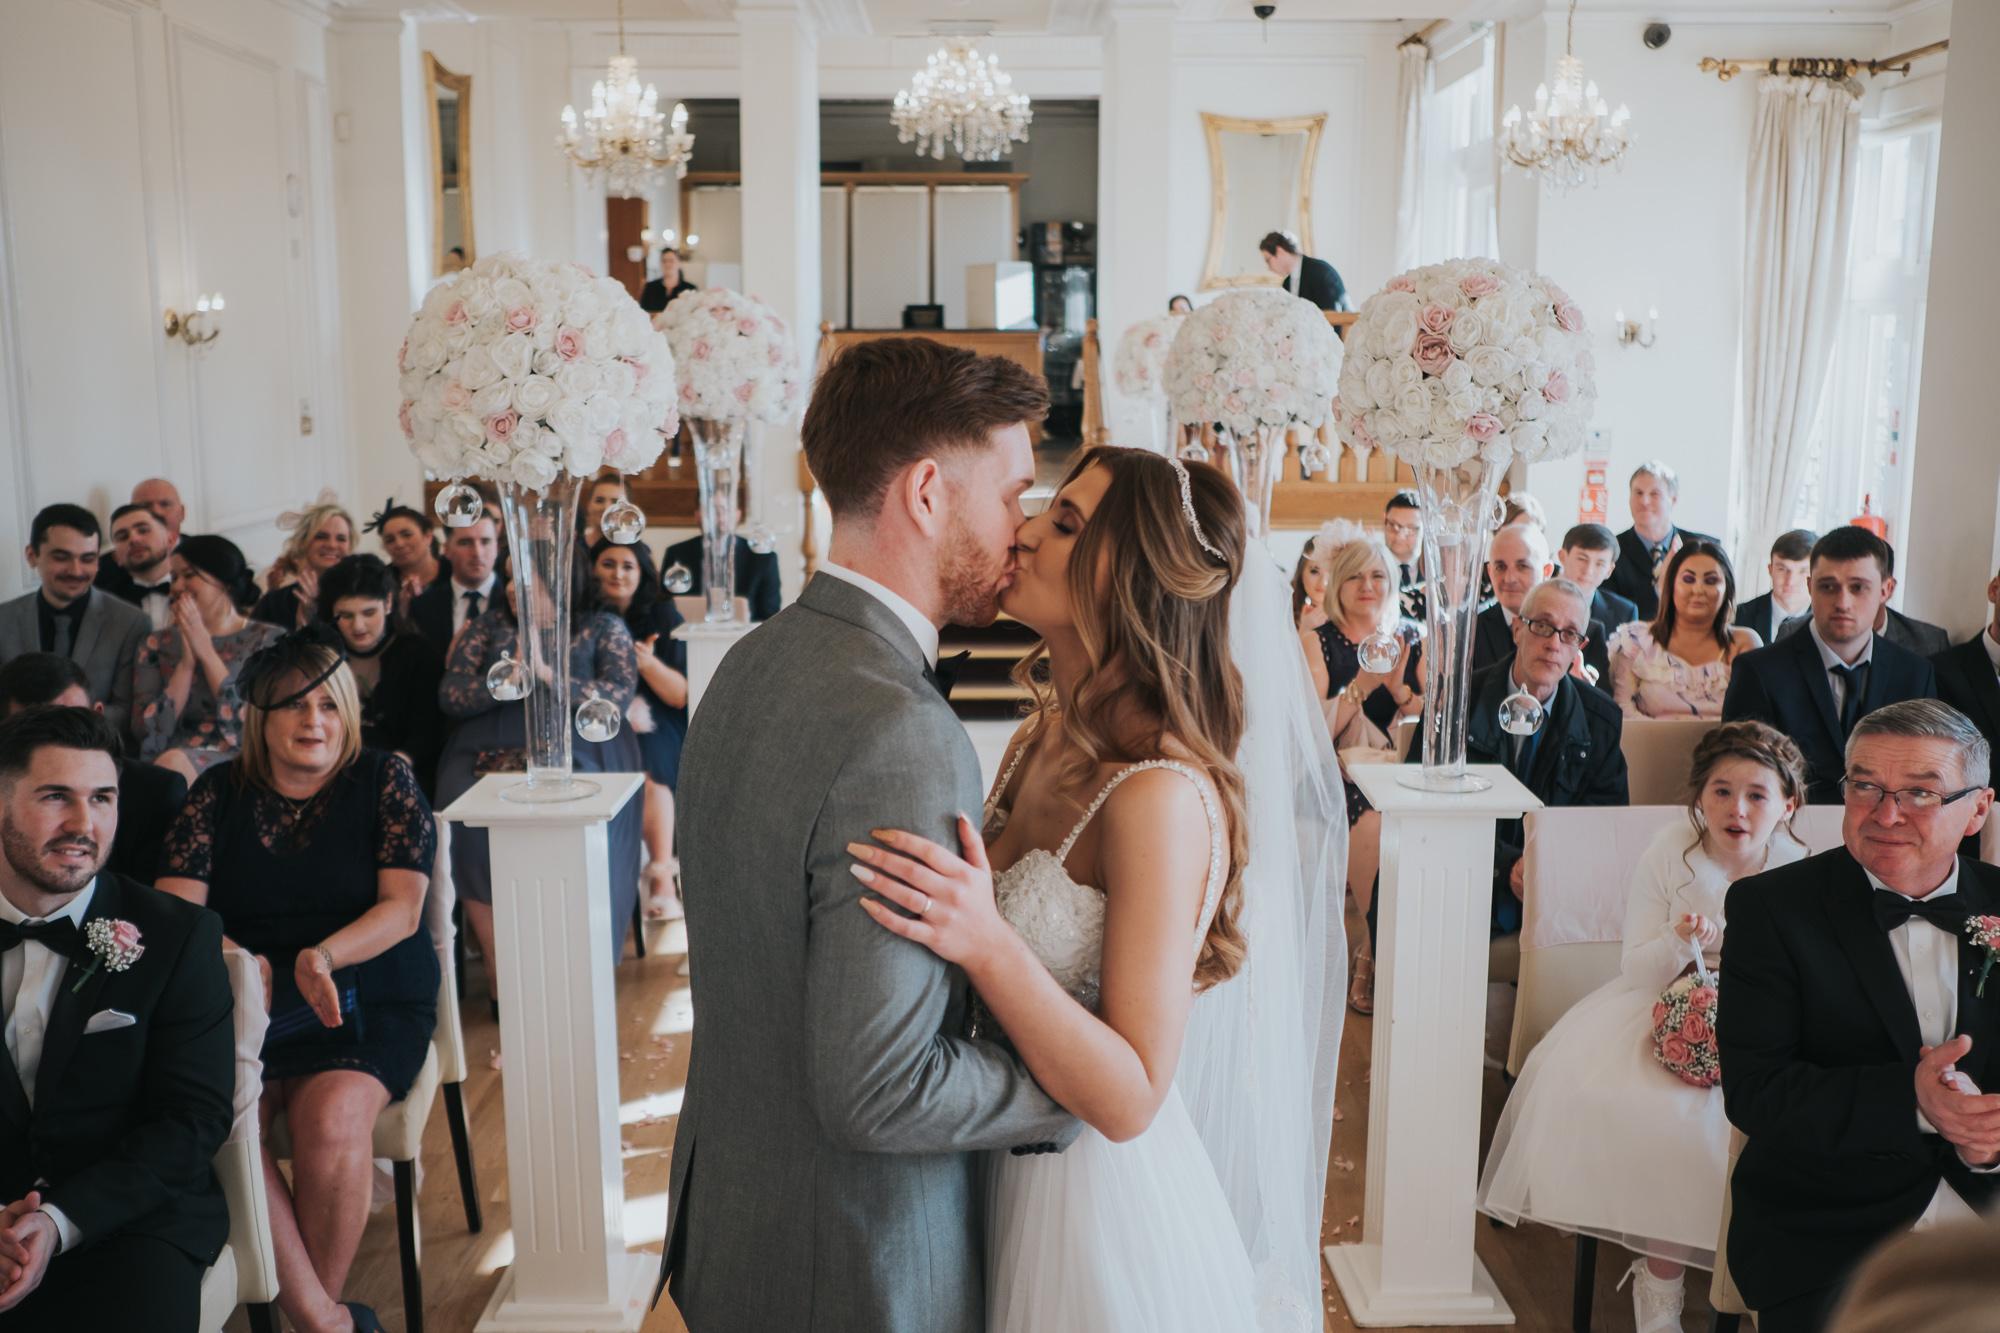 West Tower Exclusive Wedding Venue wedding photography merseyside and lancashire wedding photographer (28 of 60).jpg